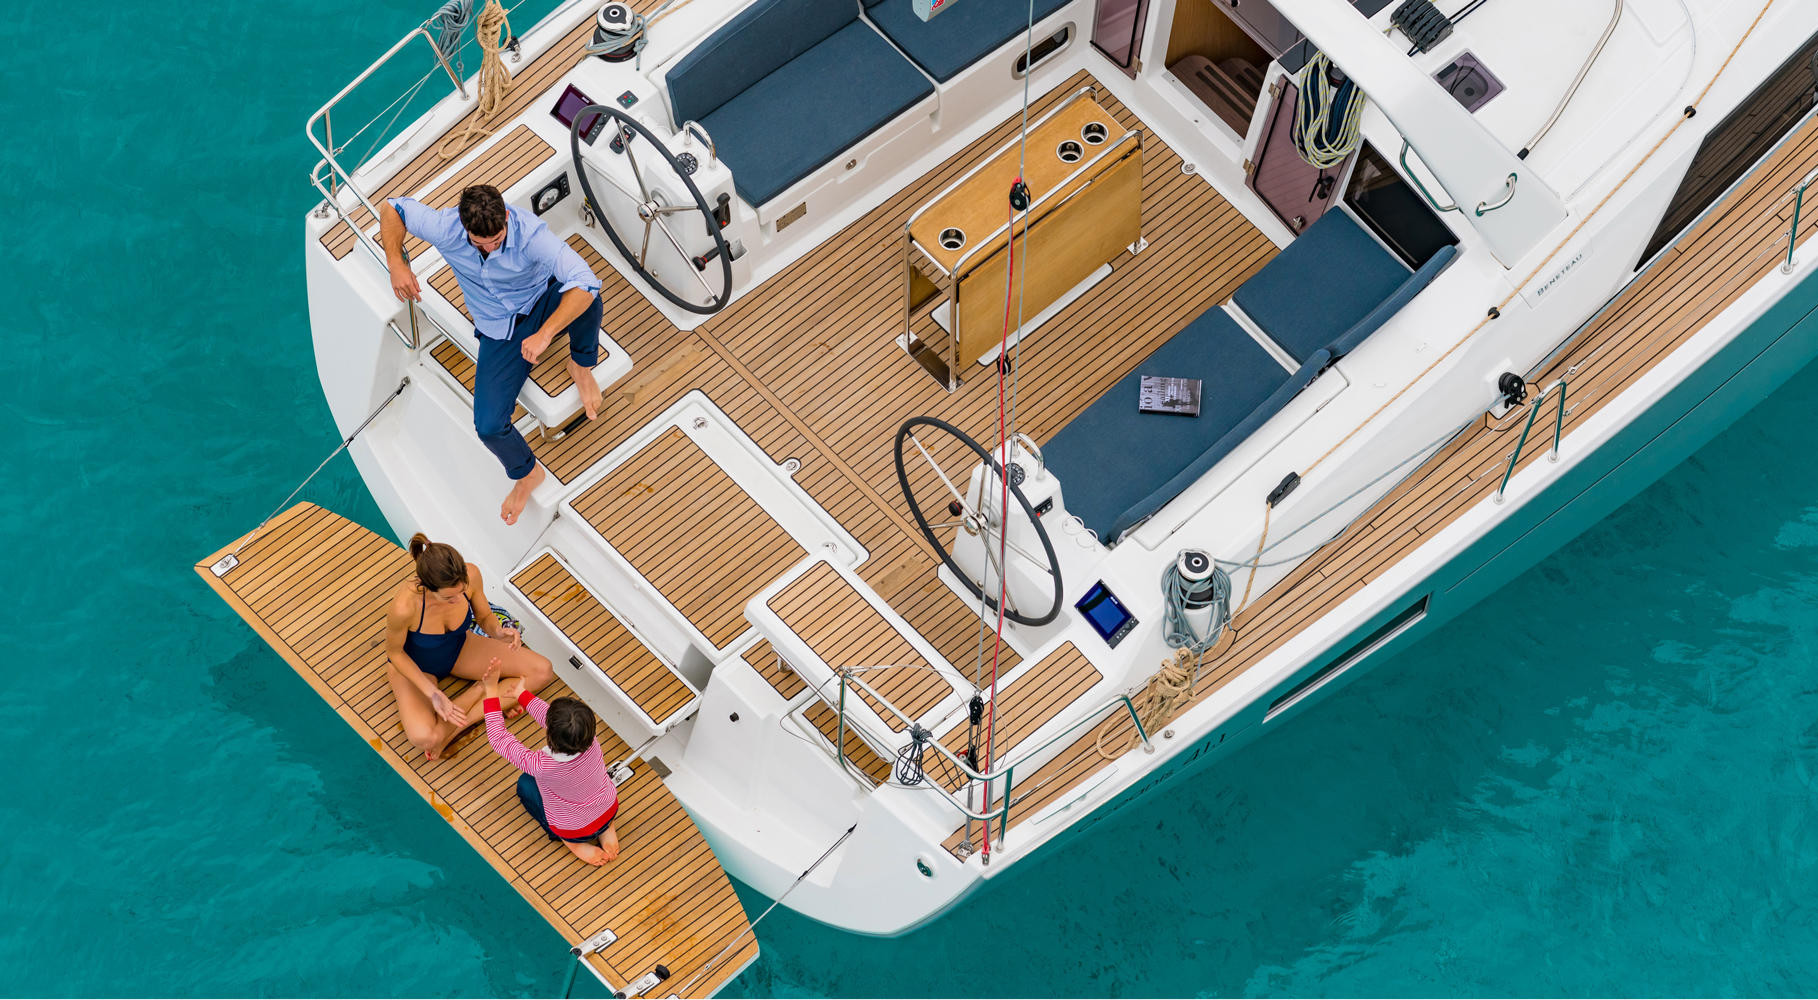 family boat sailing 5.jpg